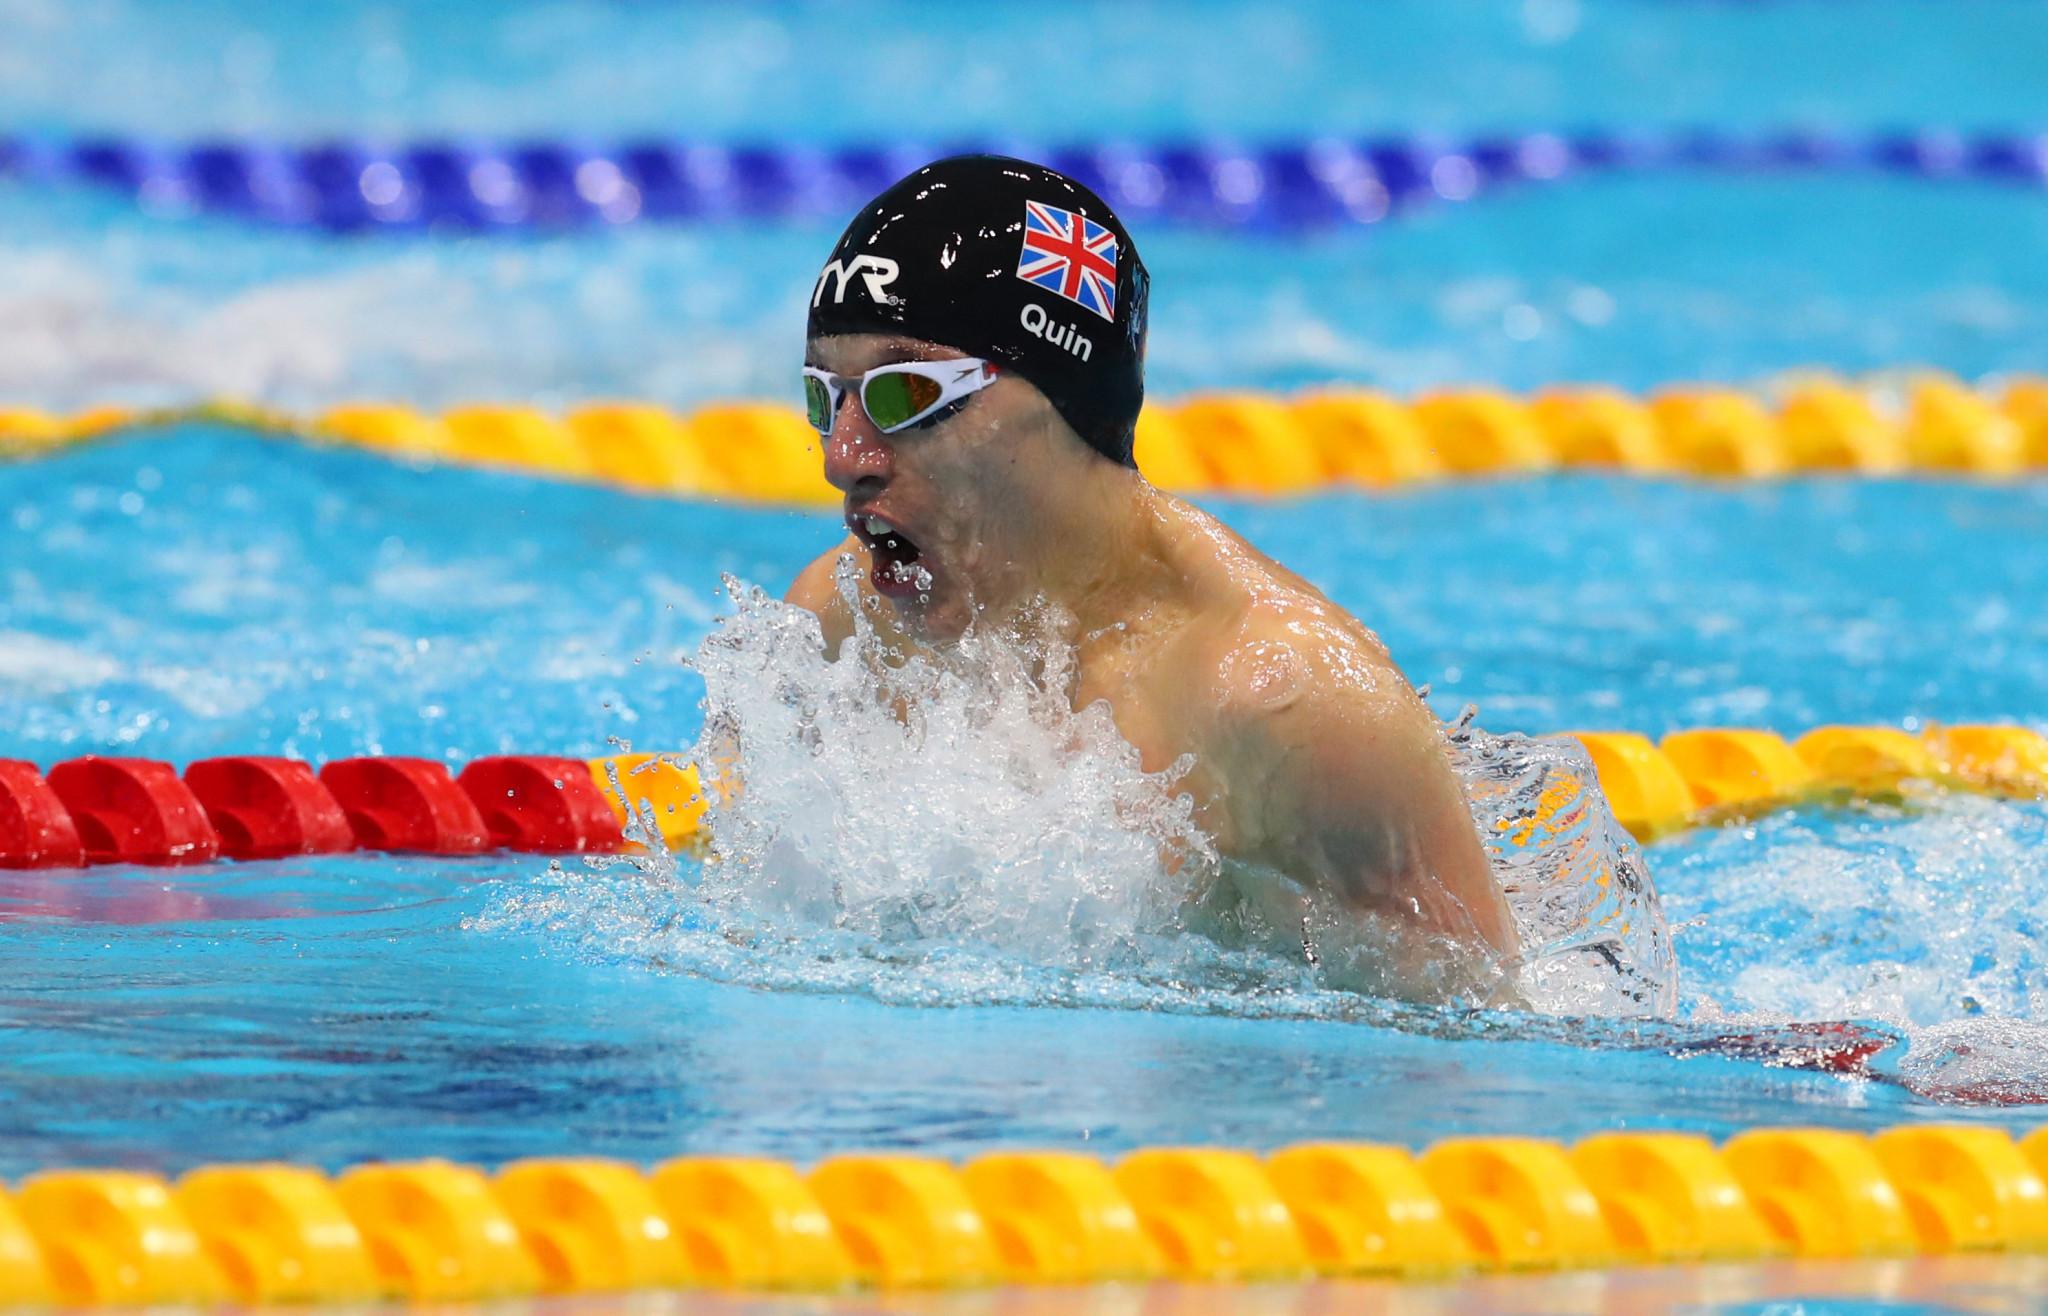 Two more wins for Moleman at Sheffield World Para Swimming World Series leg